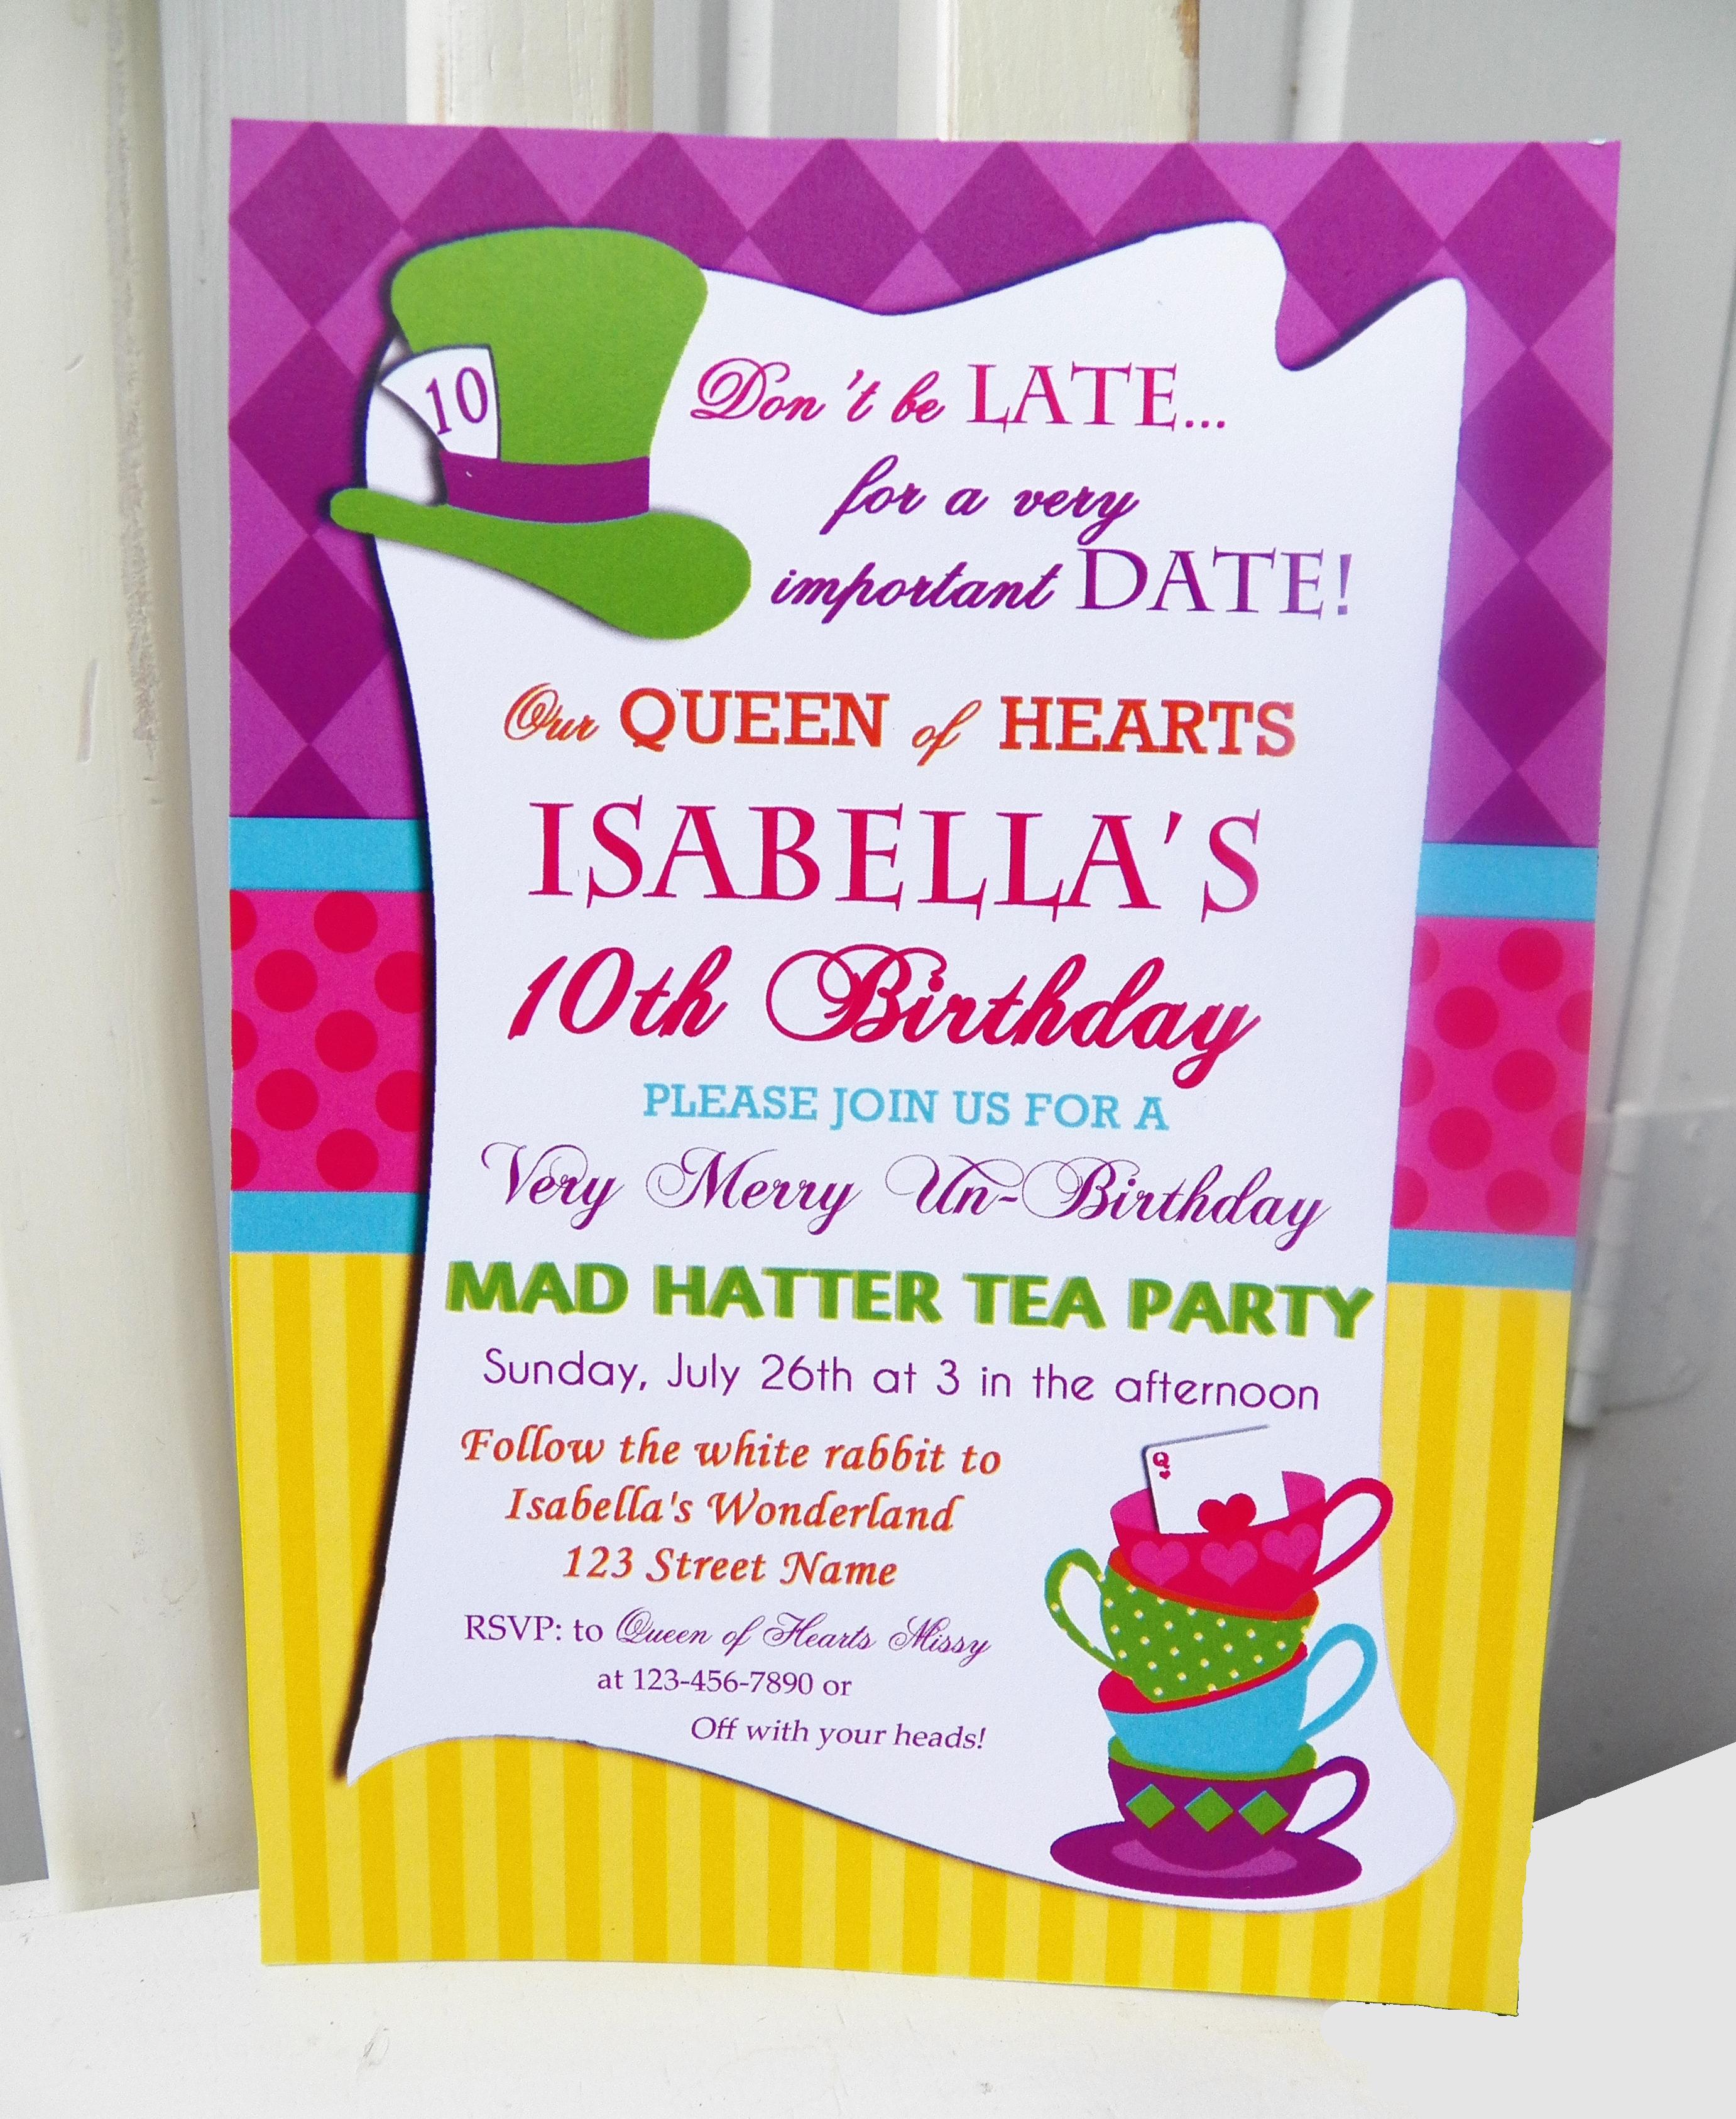 Birthday Invitation. Mad Hatter Tea Party Birthday Invitations - Mad Hatter Tea Party Invitations Free Printable